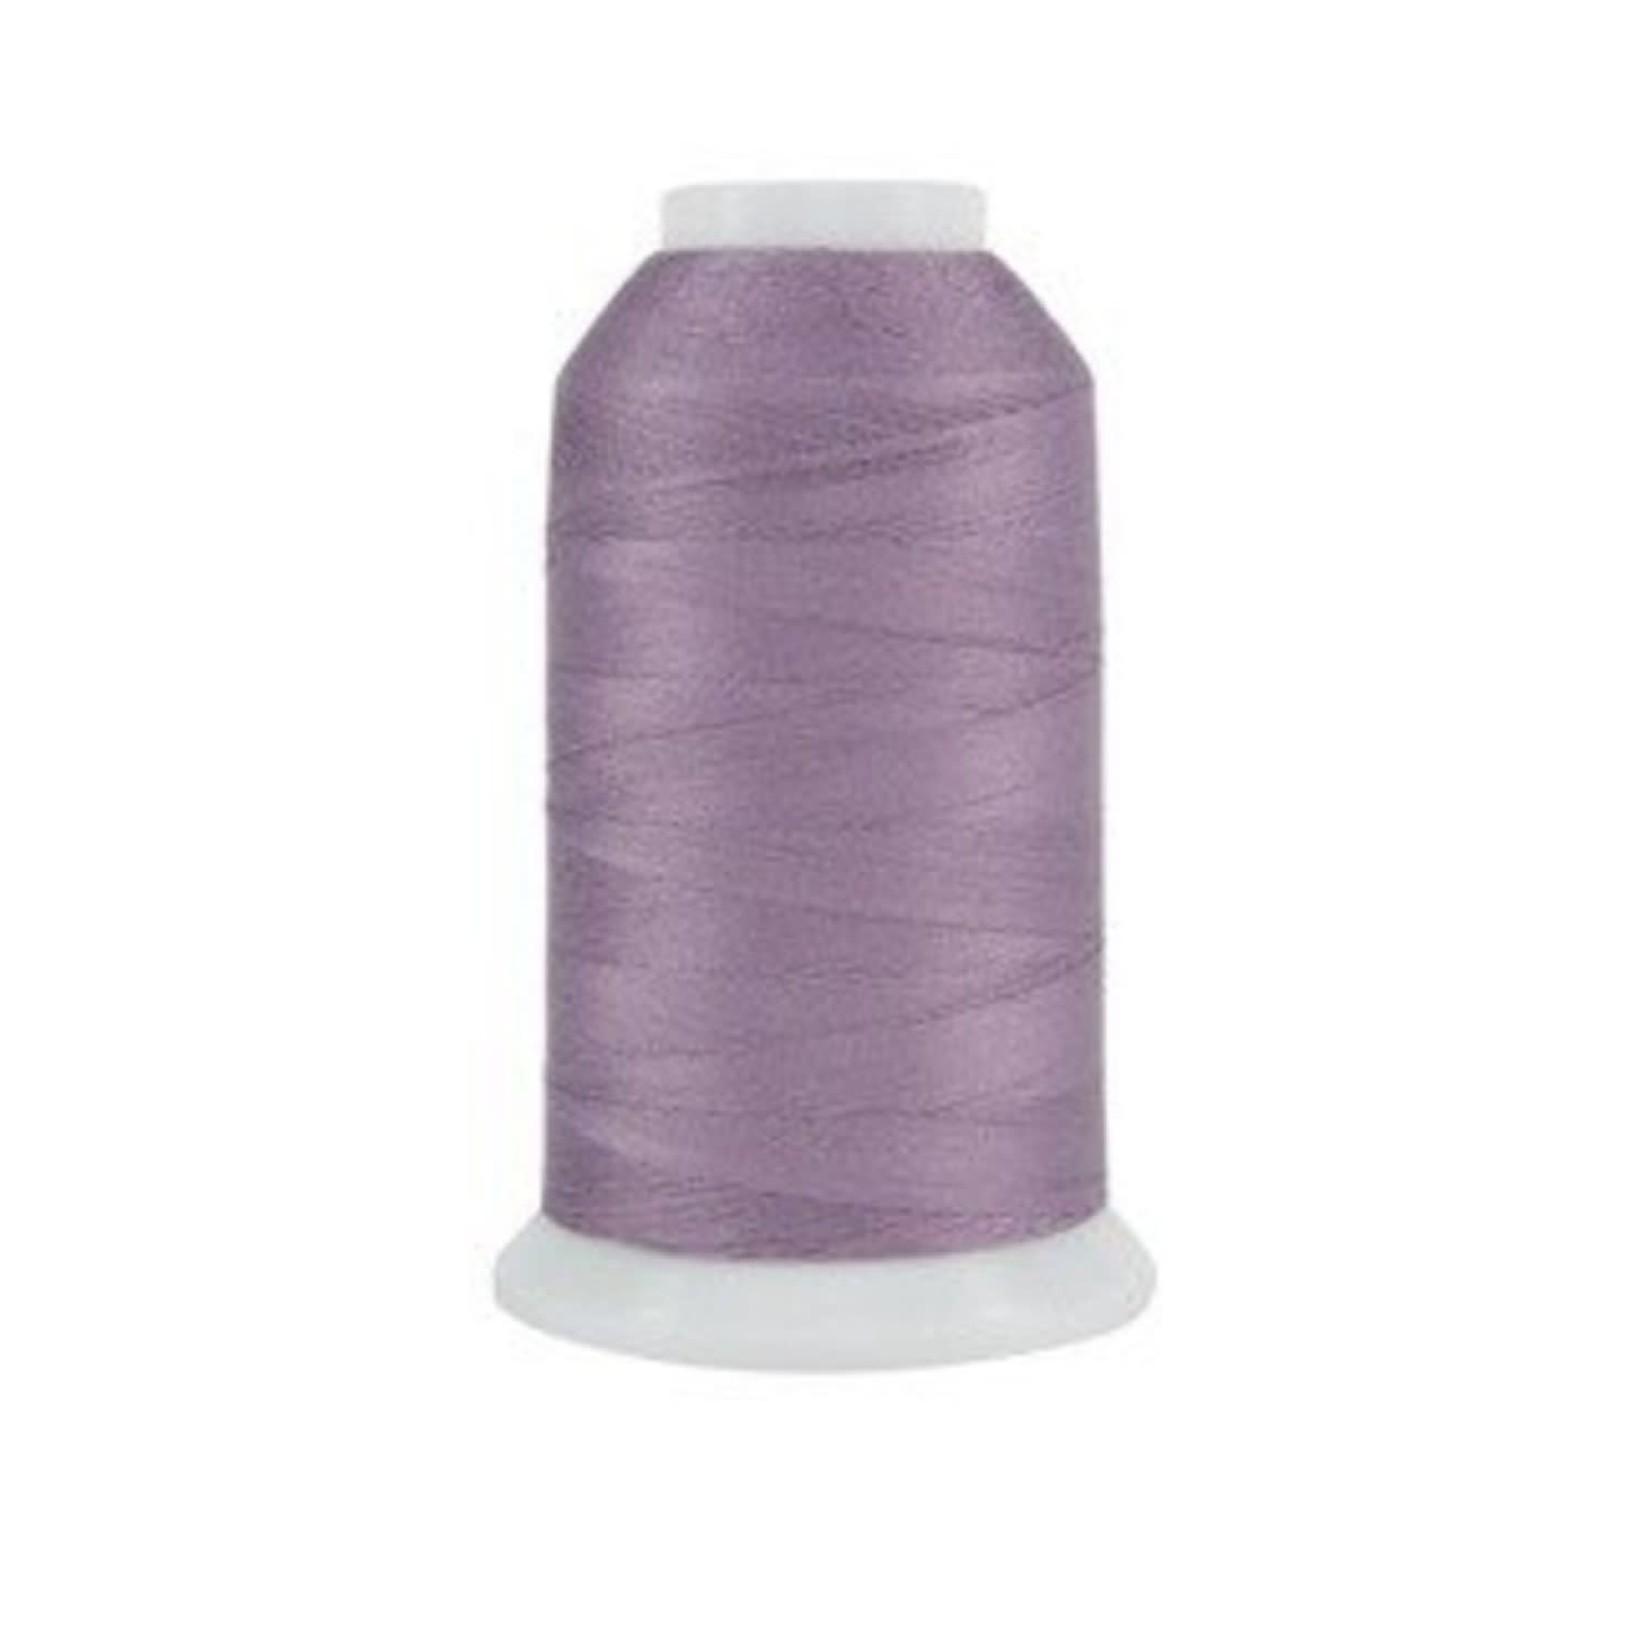 Superior Threads King Tut - #40 - 1828 m - 1022 Emily